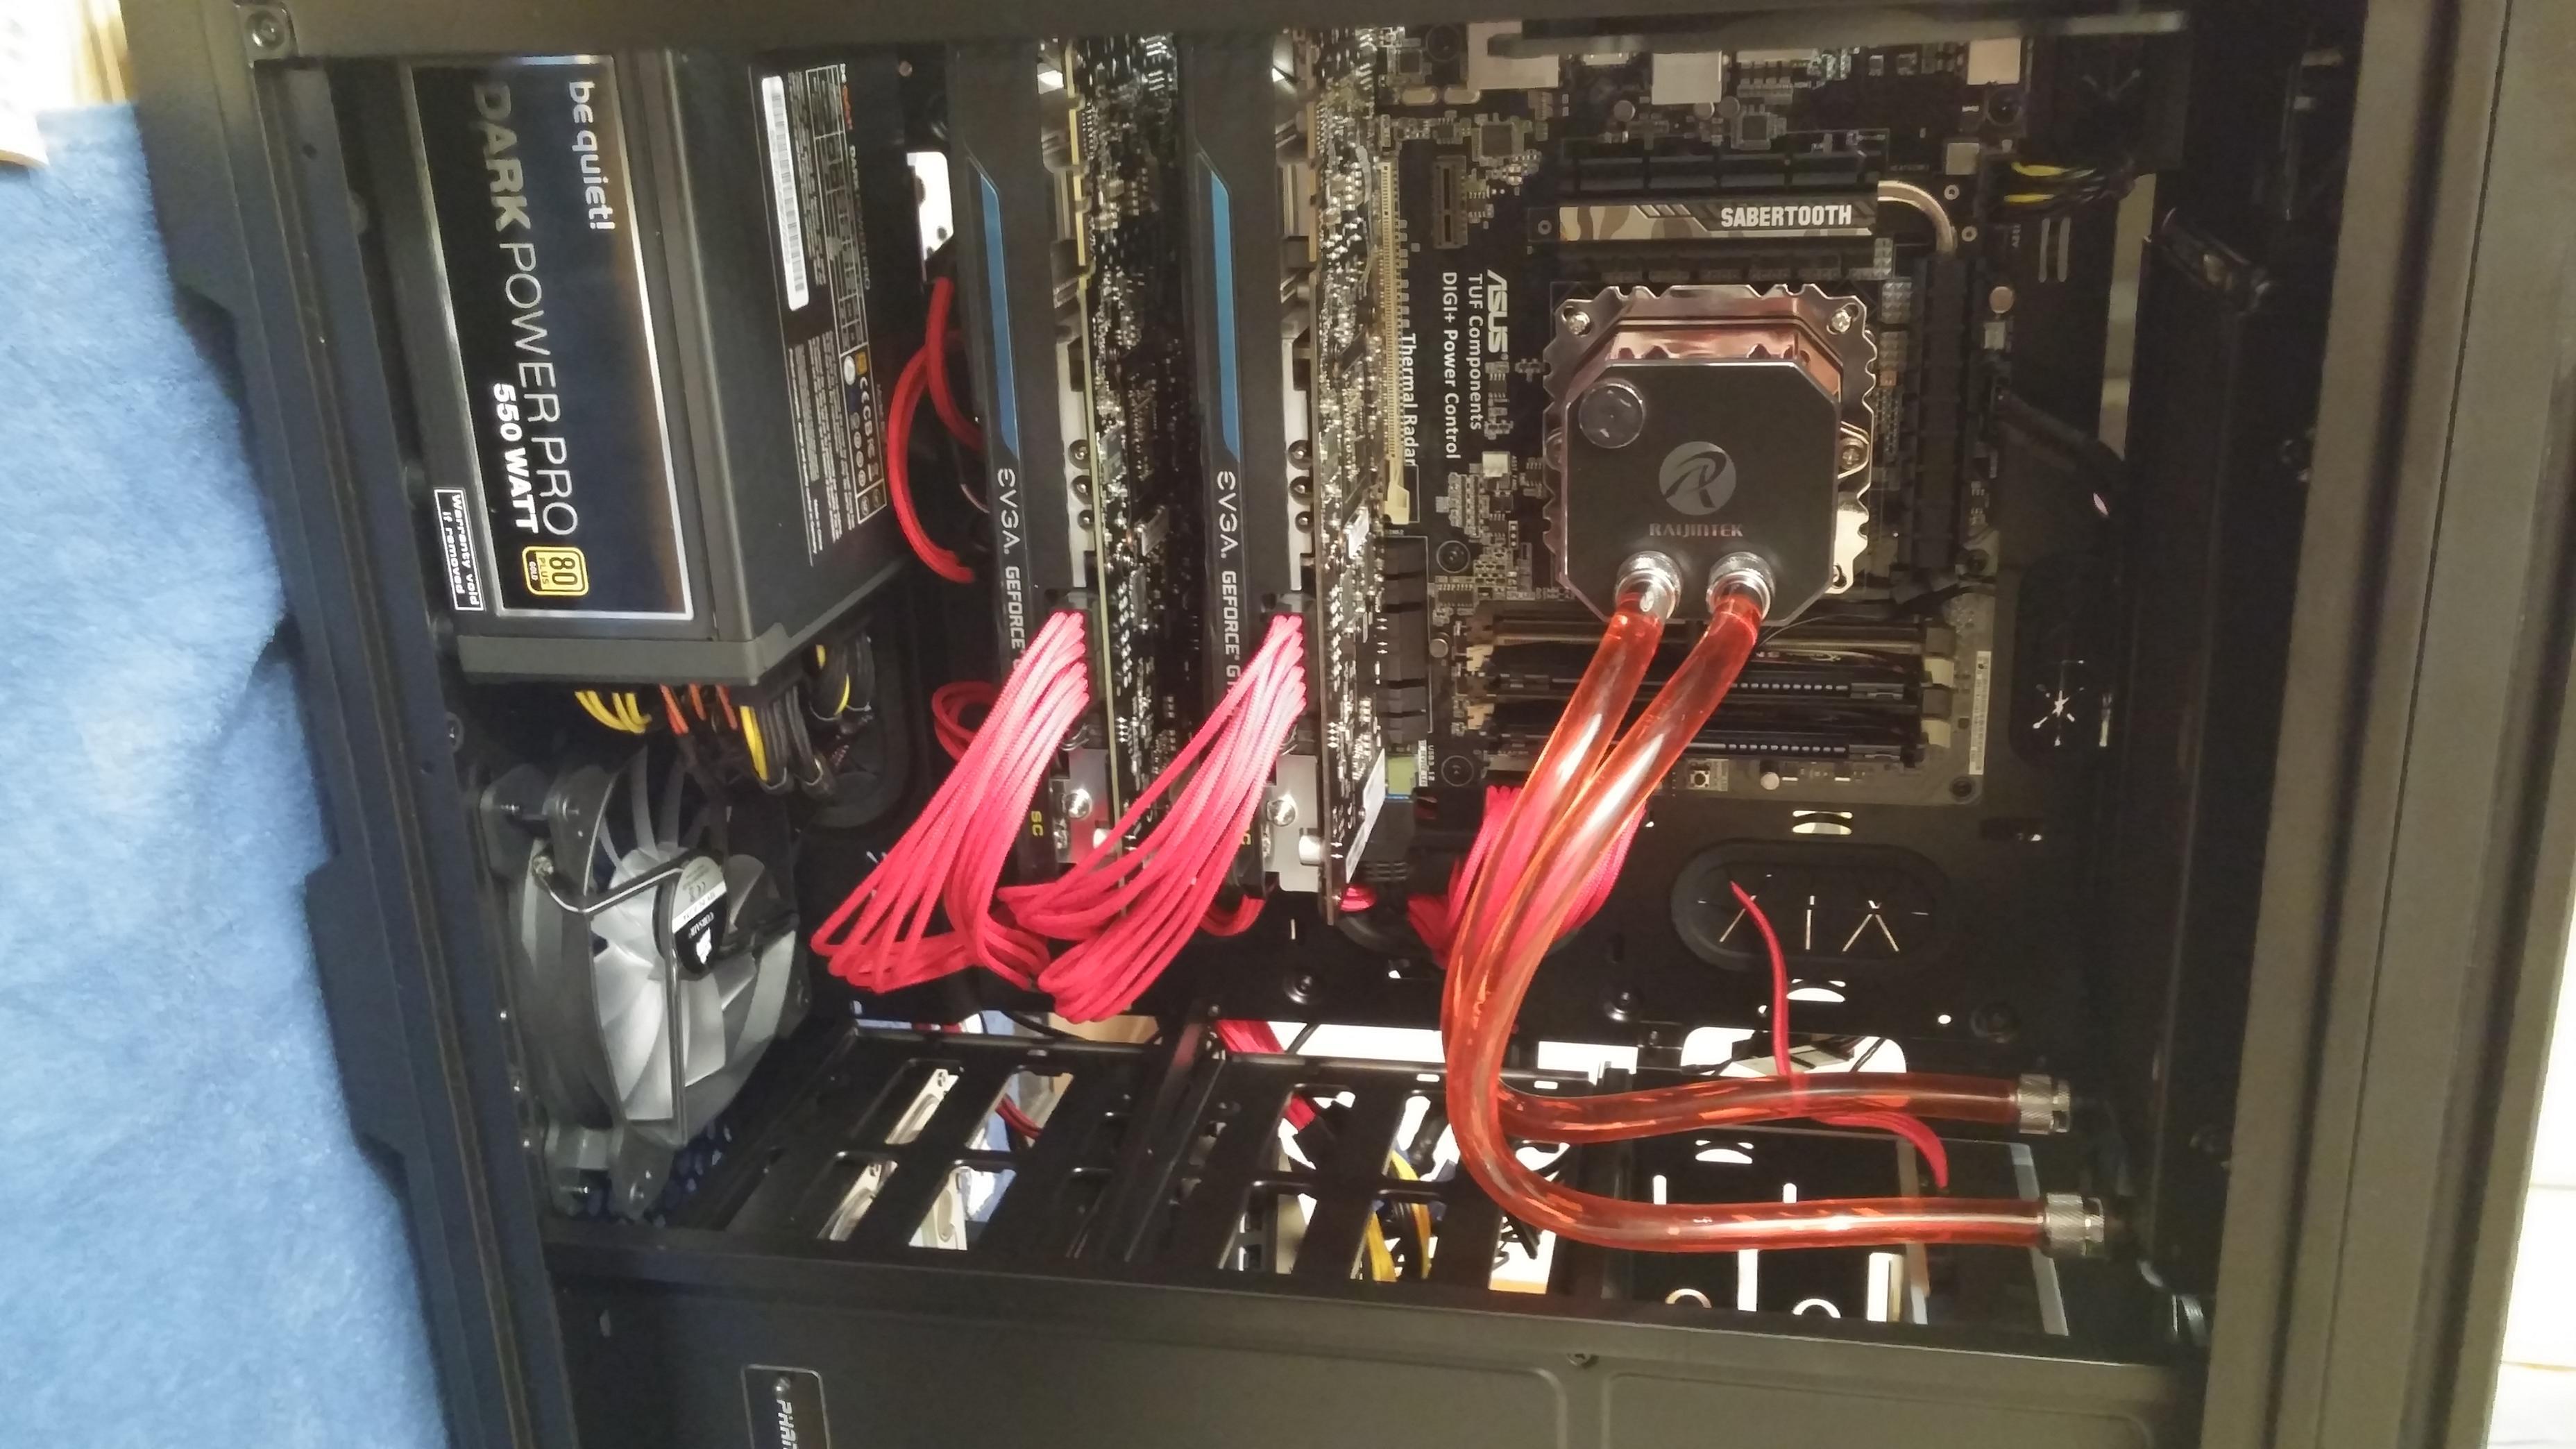 PCIe Kabel sauber führen / Generell Verkabelung - ComputerBase Forum